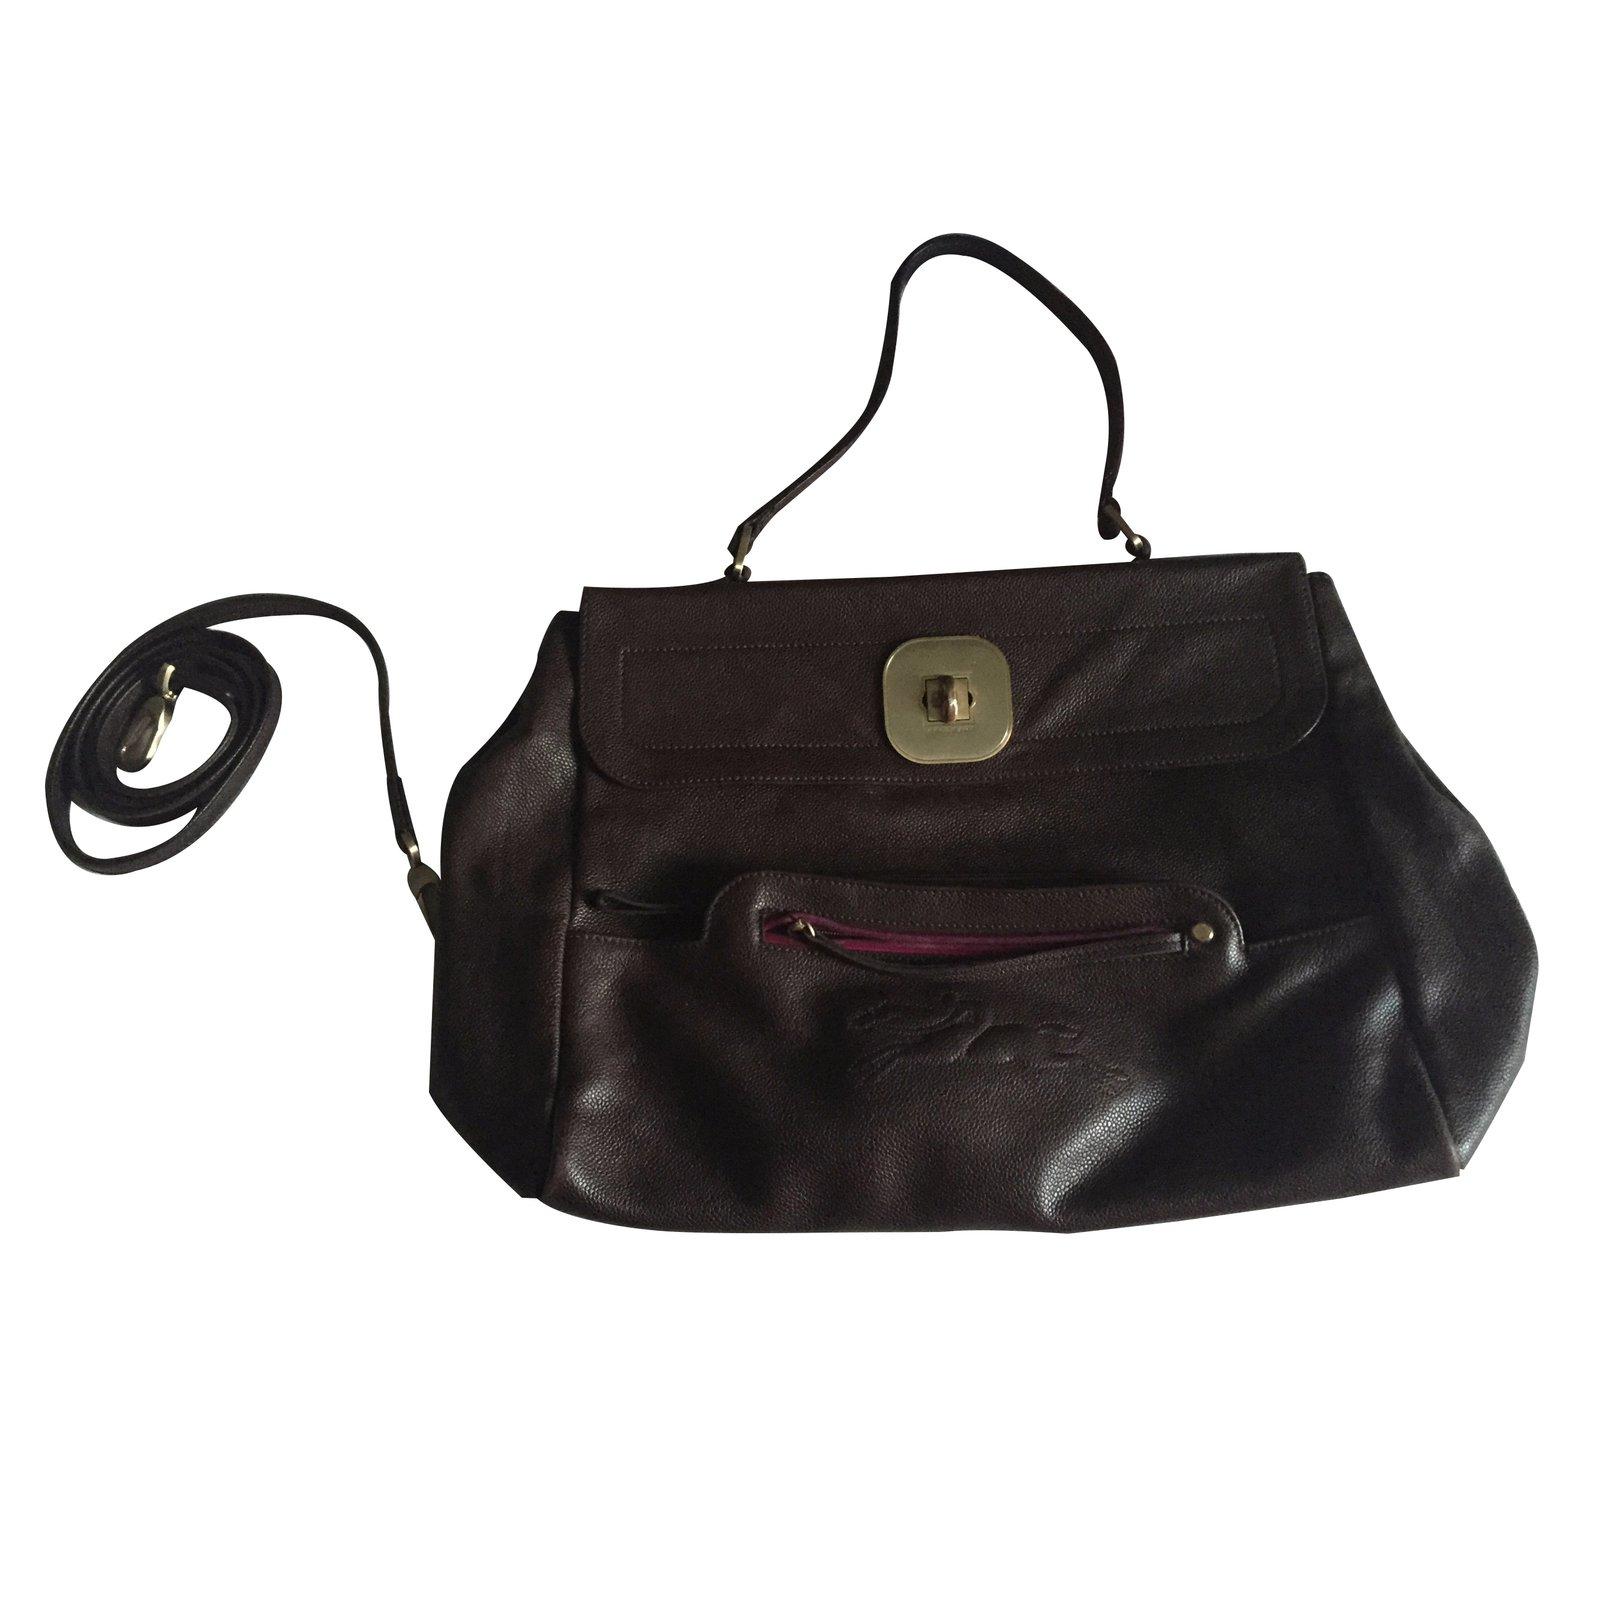 sac à main longchamp marron